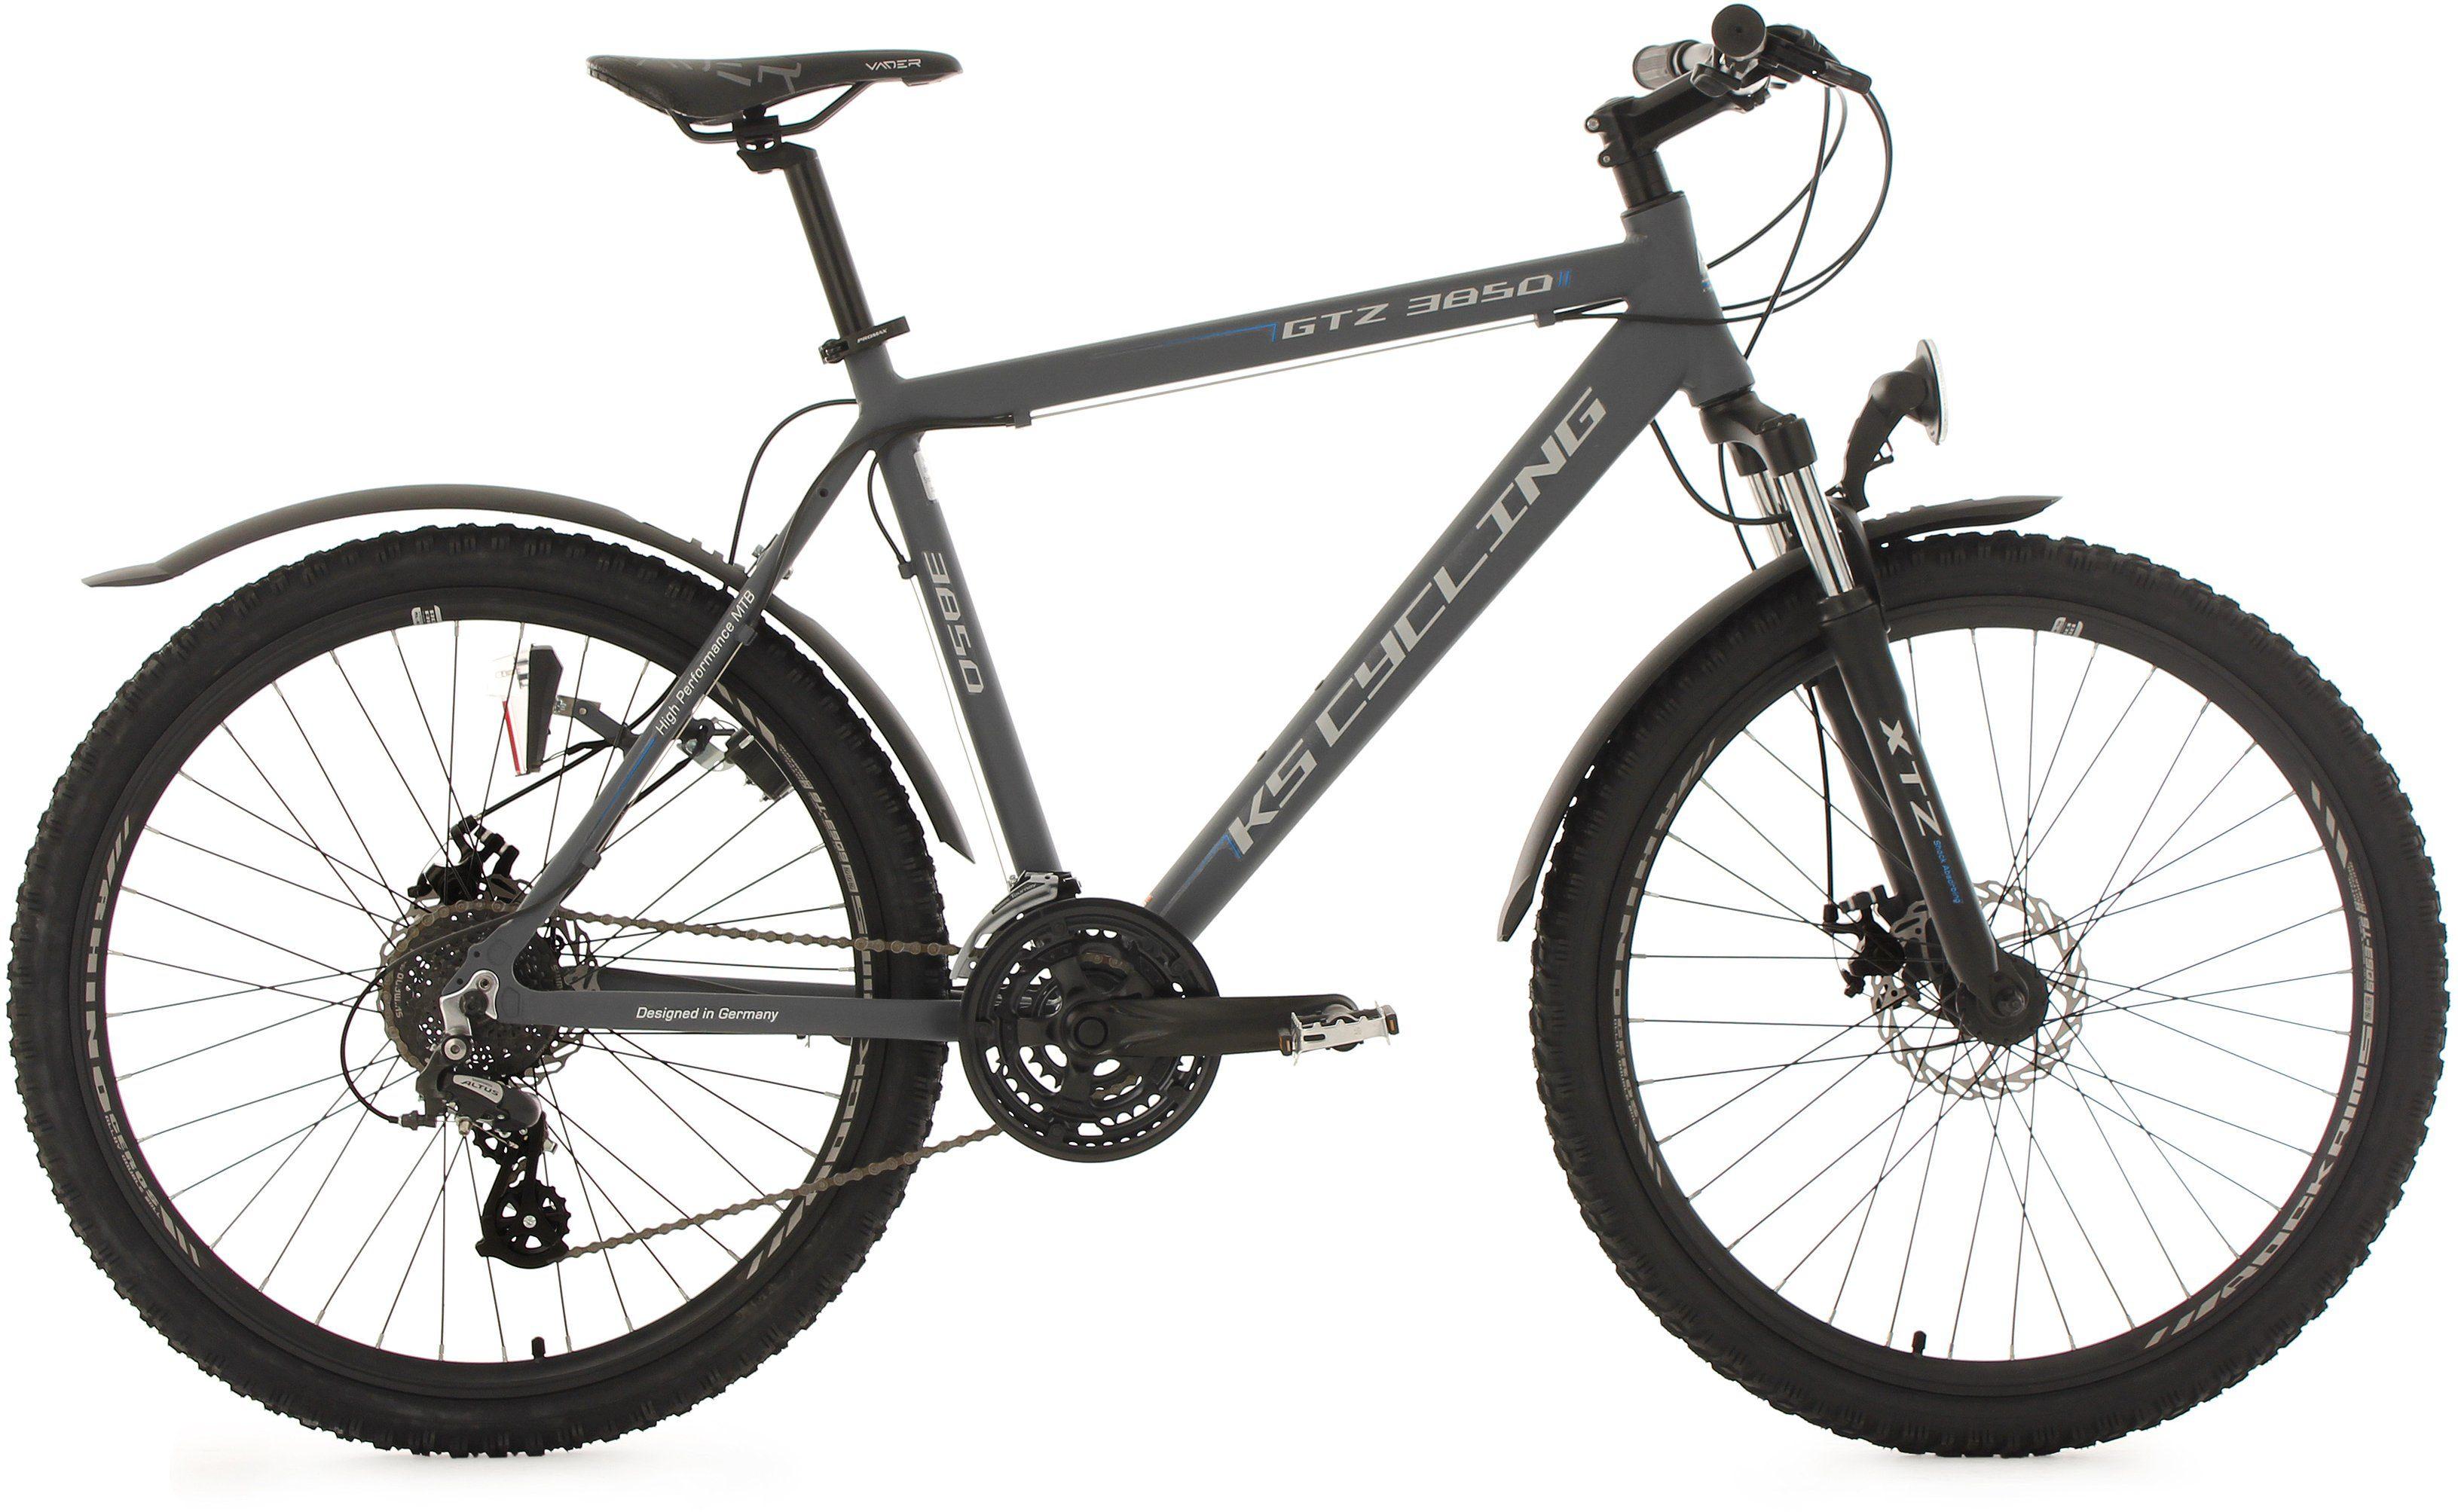 KS Cycling Herren Hardtail-MTB, 26 Zoll, 24 Gang-Shimano Altus Kettenschaltung, anthrazit, »GTZ«